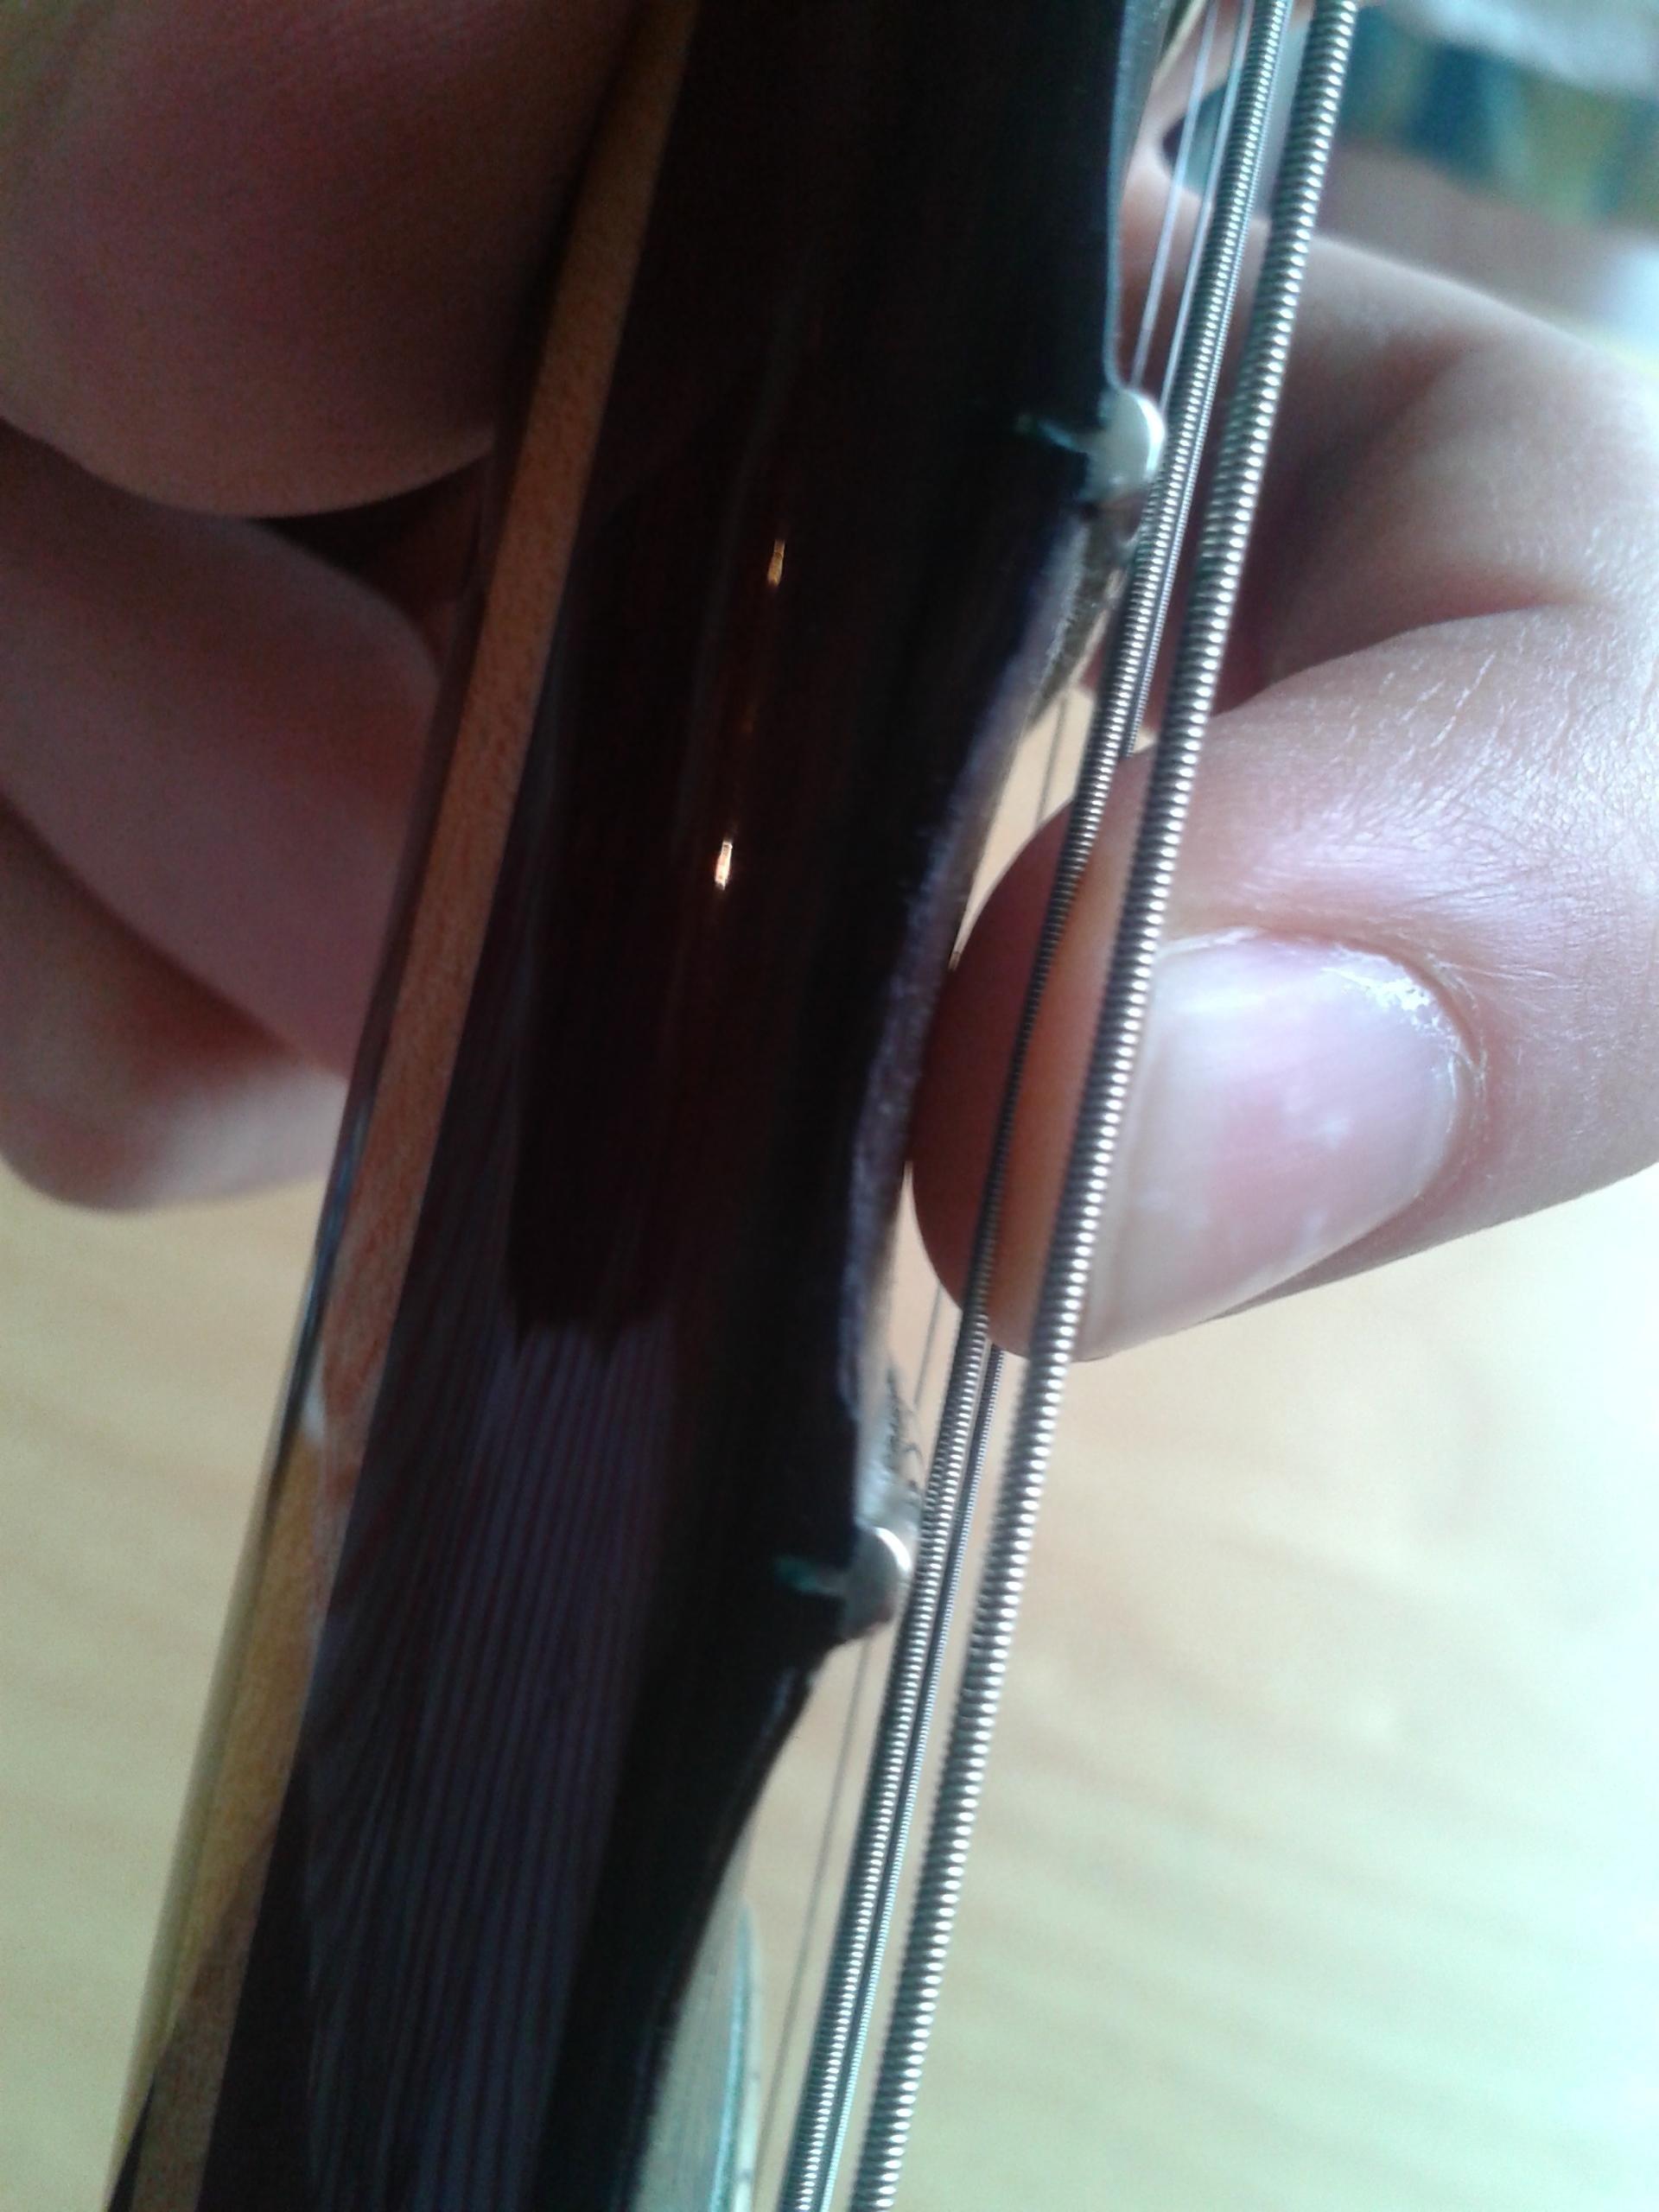 Scalloped Fingerboard Bend